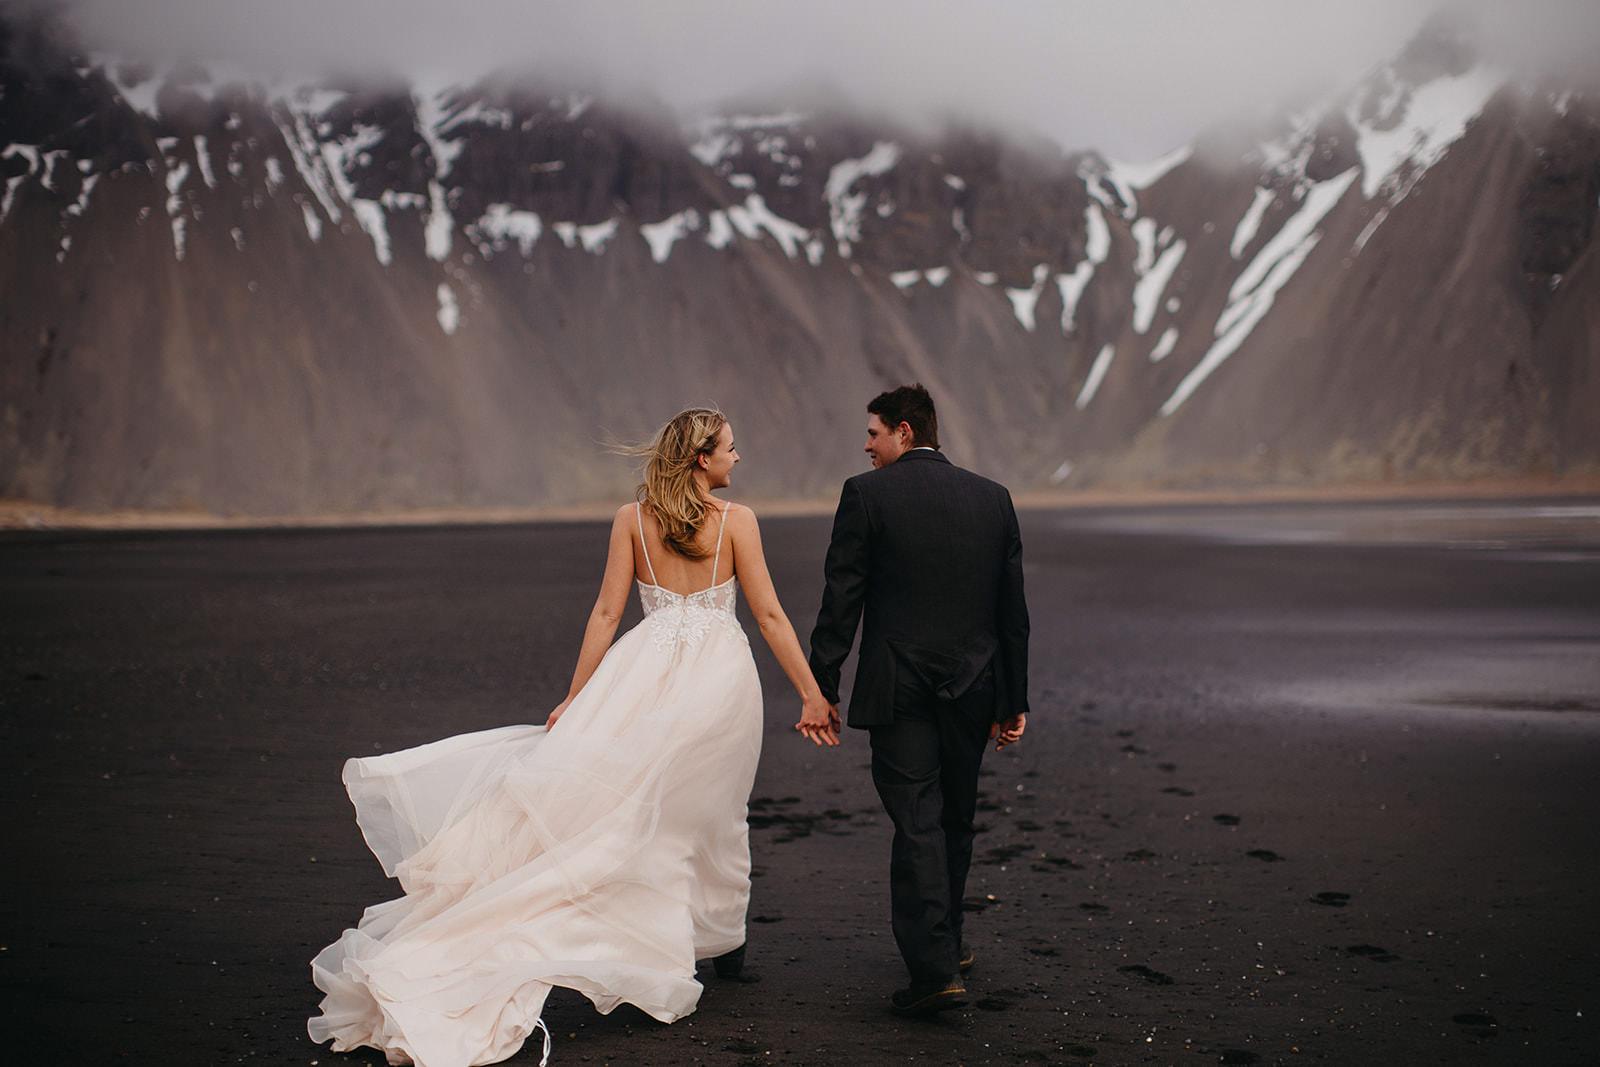 Icelandic Iceland Elopement Wedding Elope Photographer Eloping Reykjavík Vik Black Sand Beach Jökulsárlón Skogafoss Waterfall Vestrahorn Mountain Liz Osban Photography Destination 41.jpg